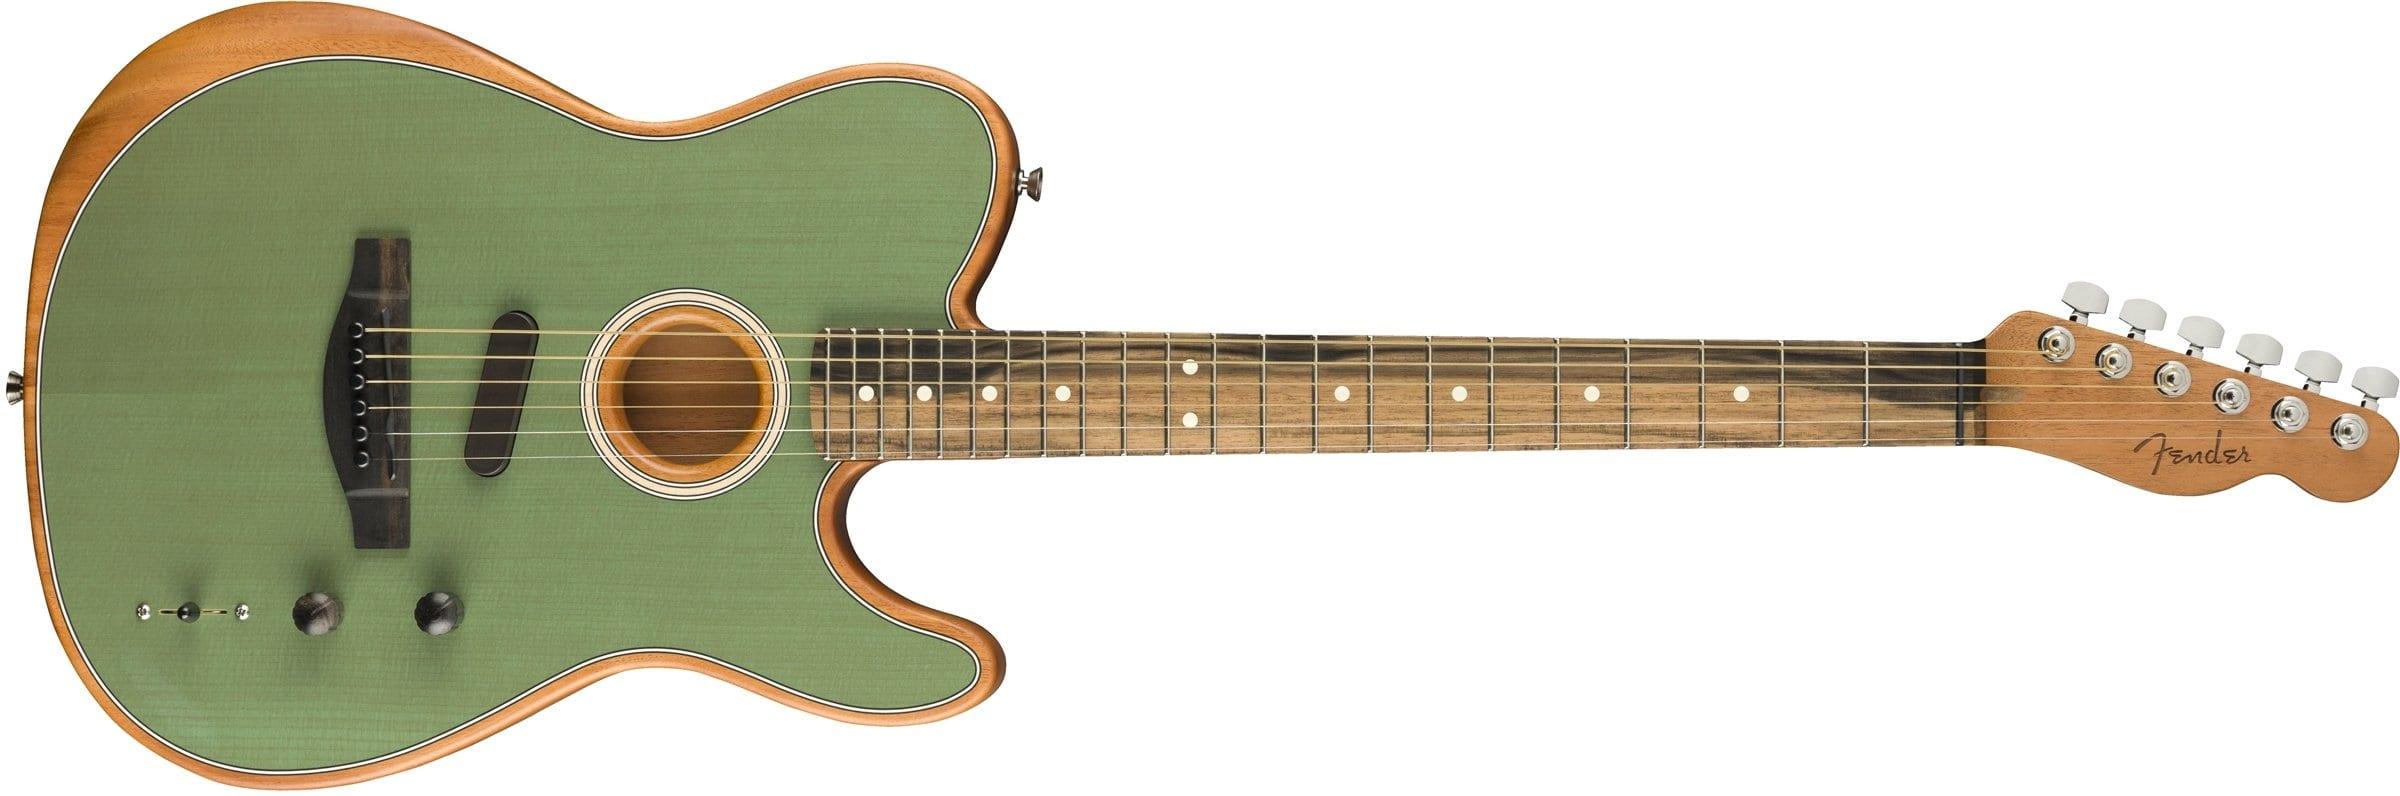 NAMM 2019 Fender American Acoustasonic Series Telecaster in Seafoam green